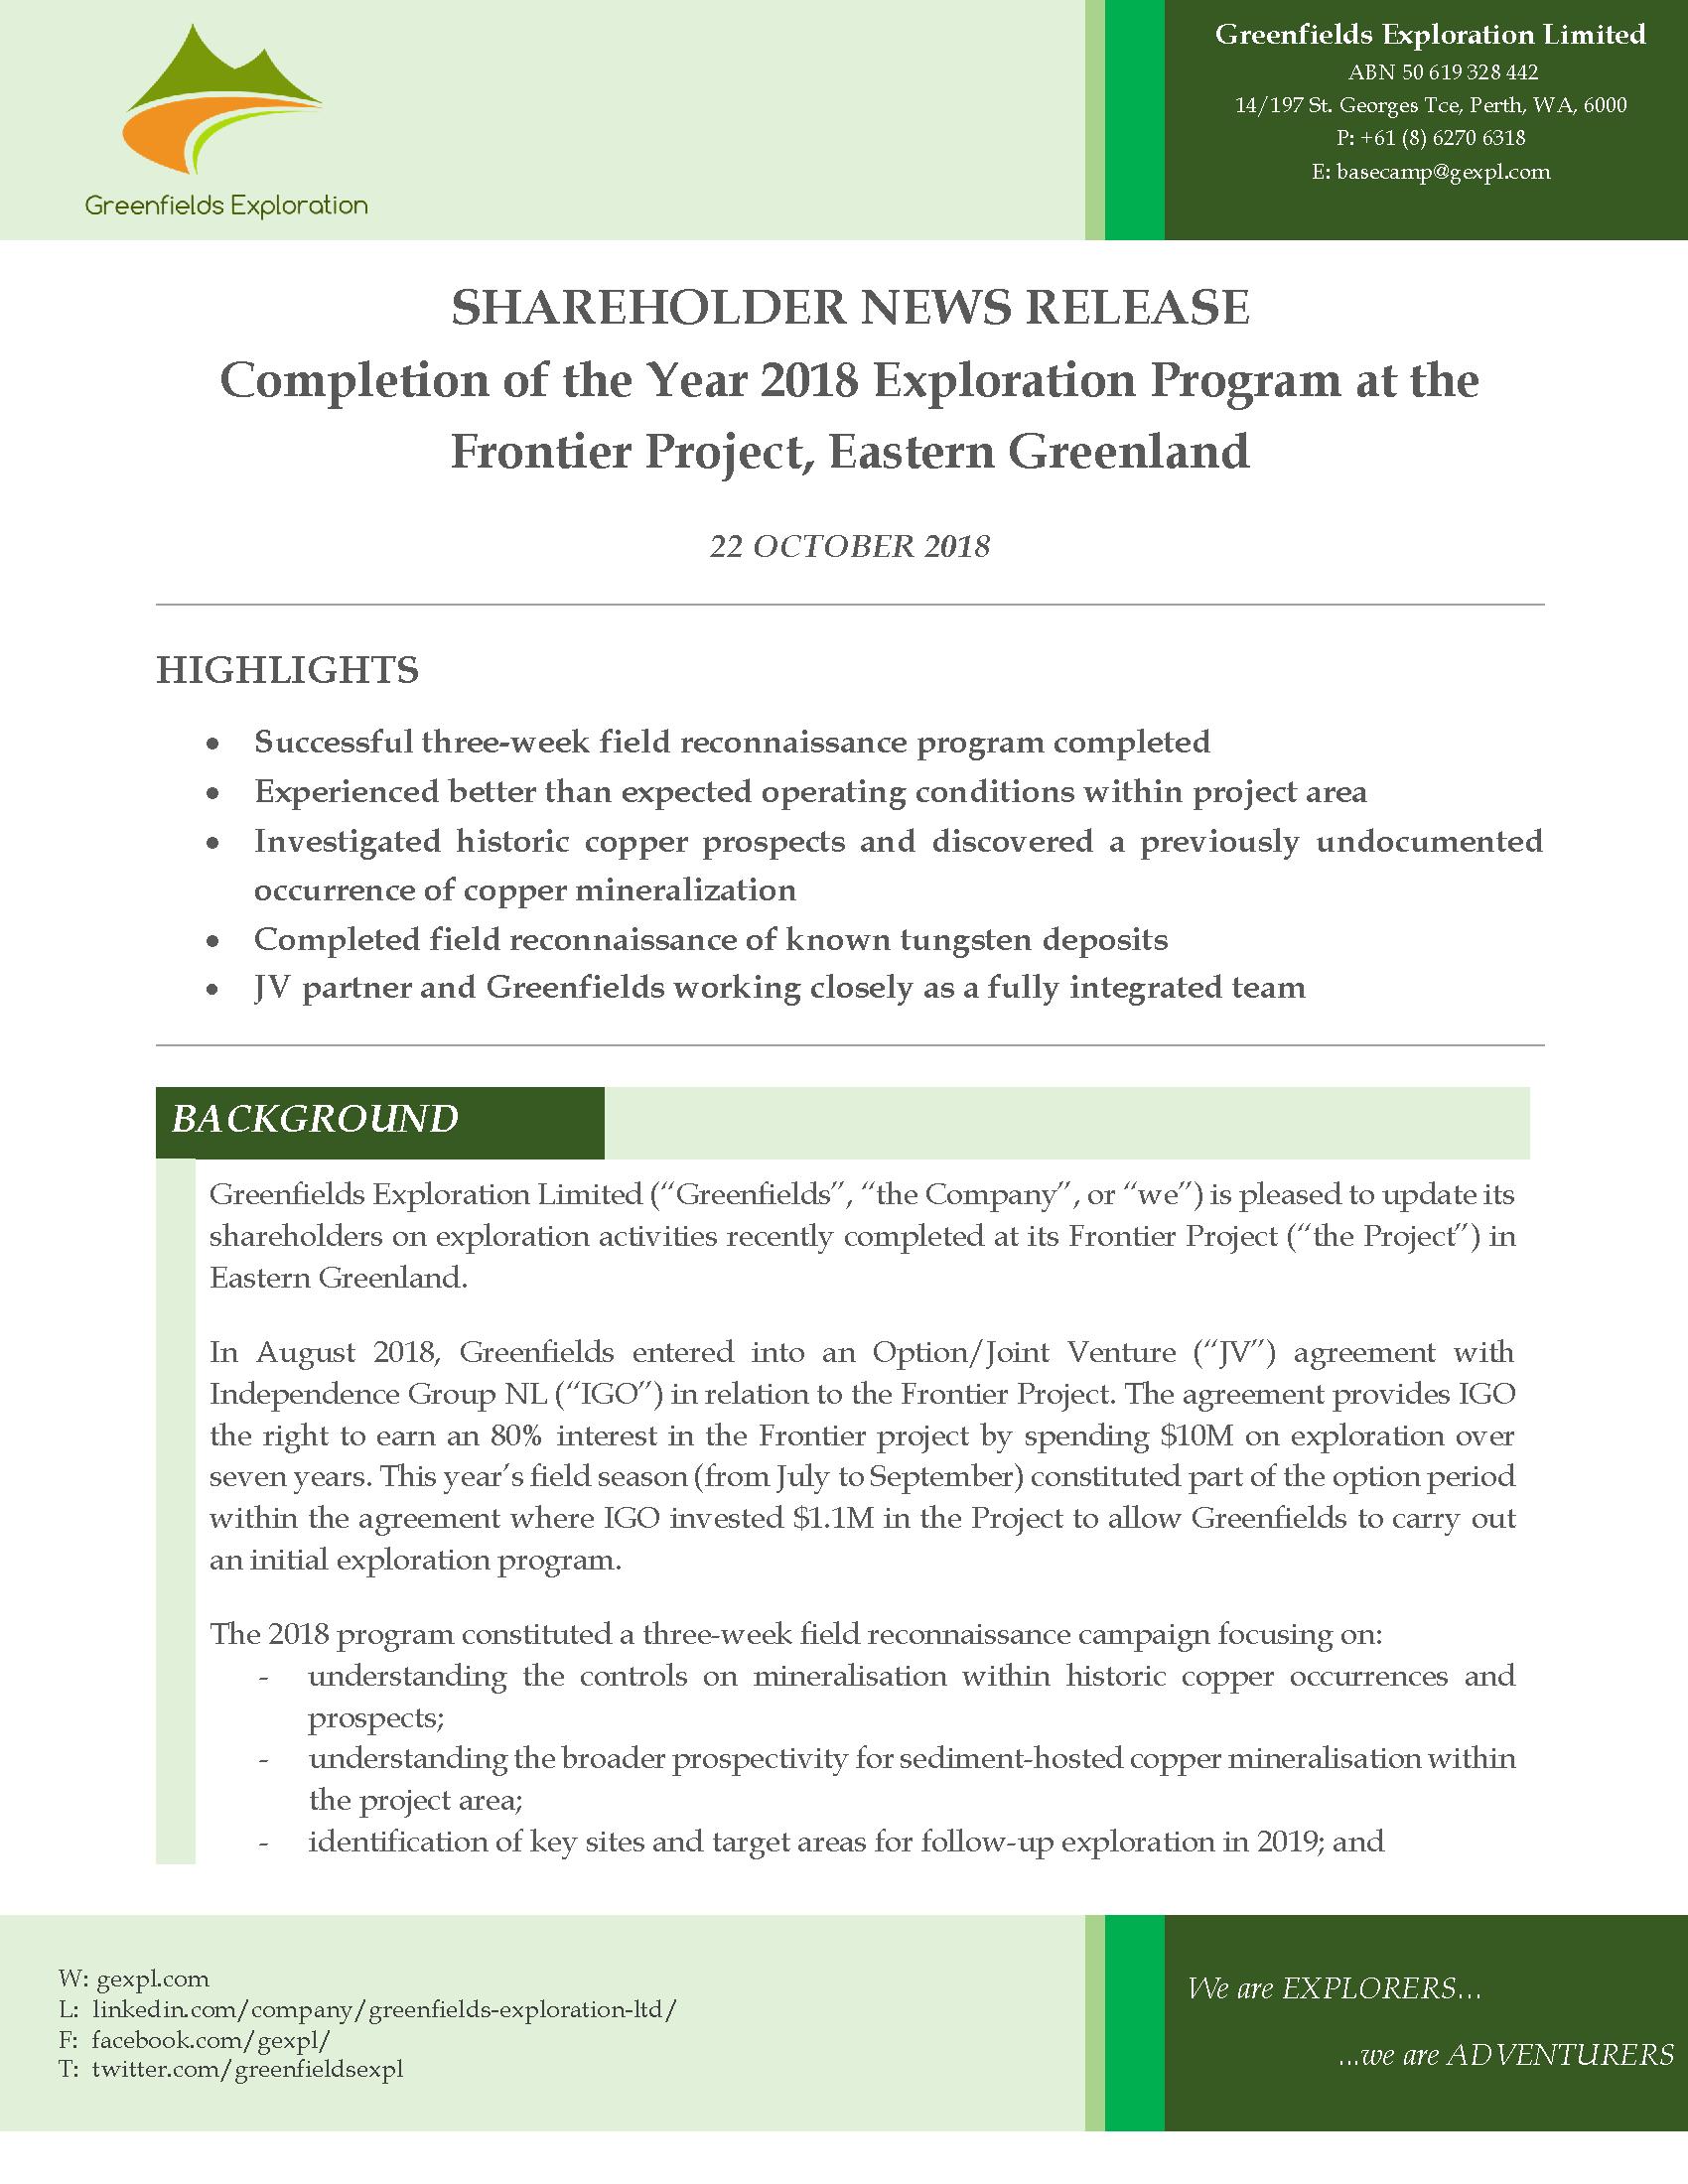 20181022_Greenfields_Shareholder news_2018 Expln Program_Page_01.png